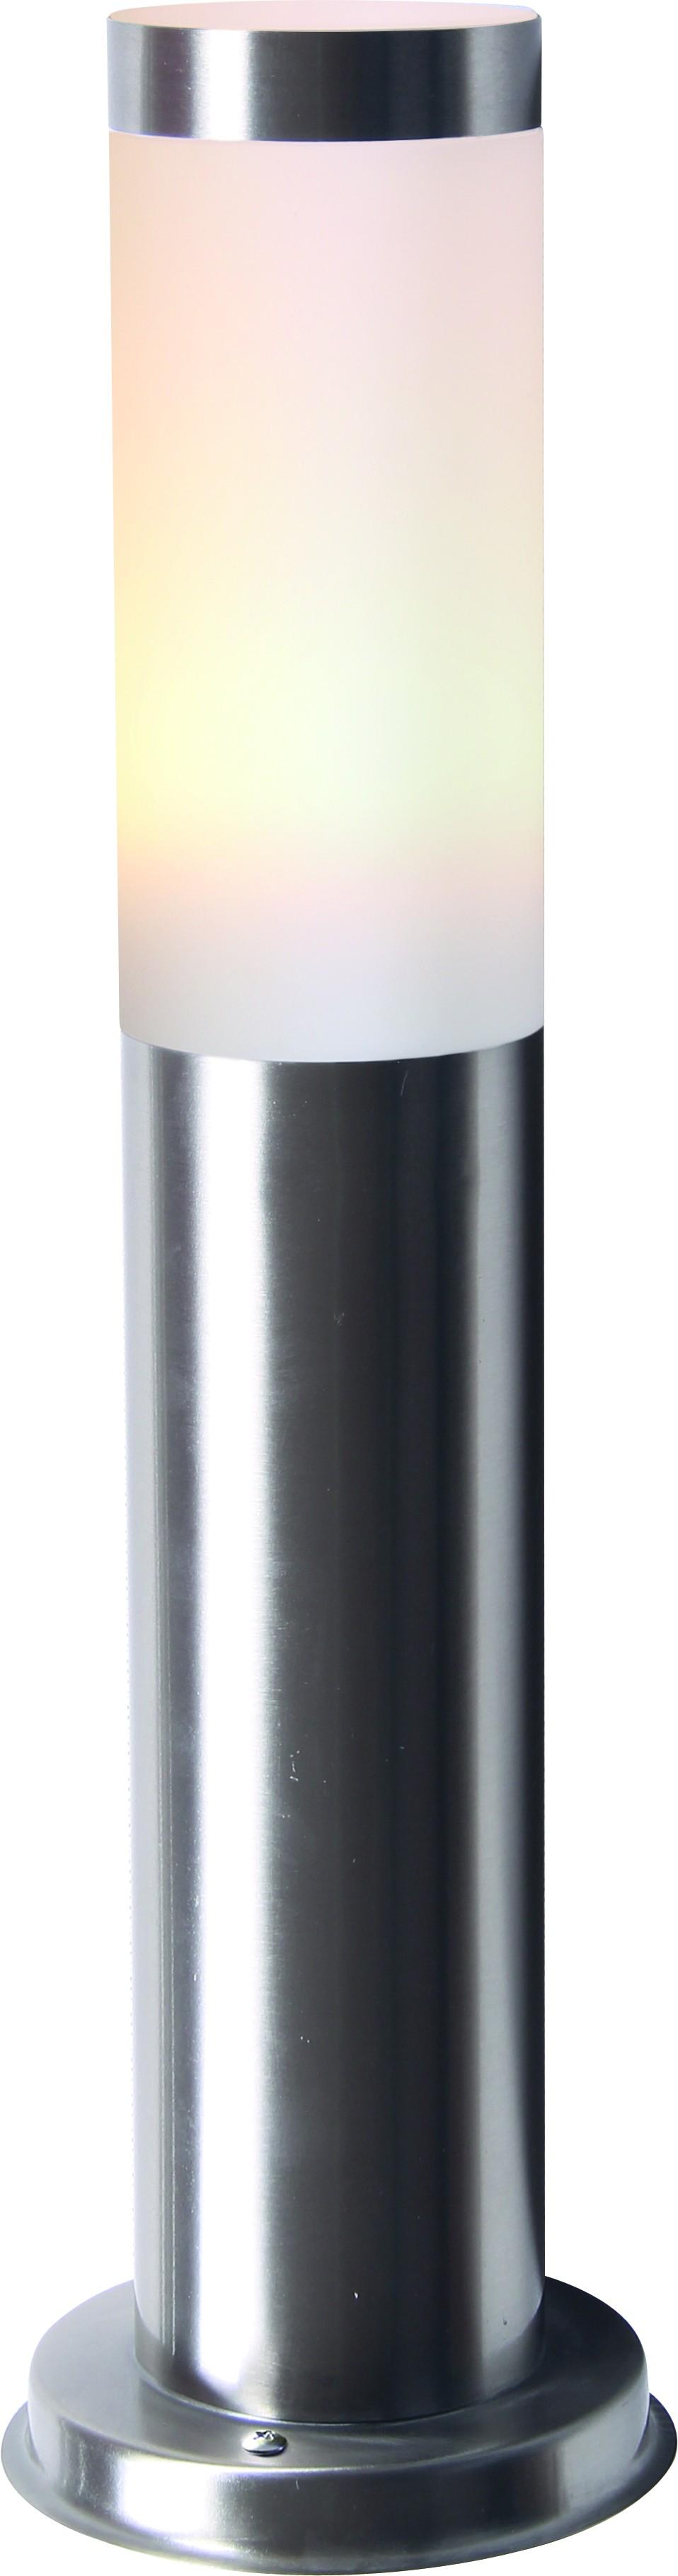 Светильник уличный Arte lamp A3158pa-1ss